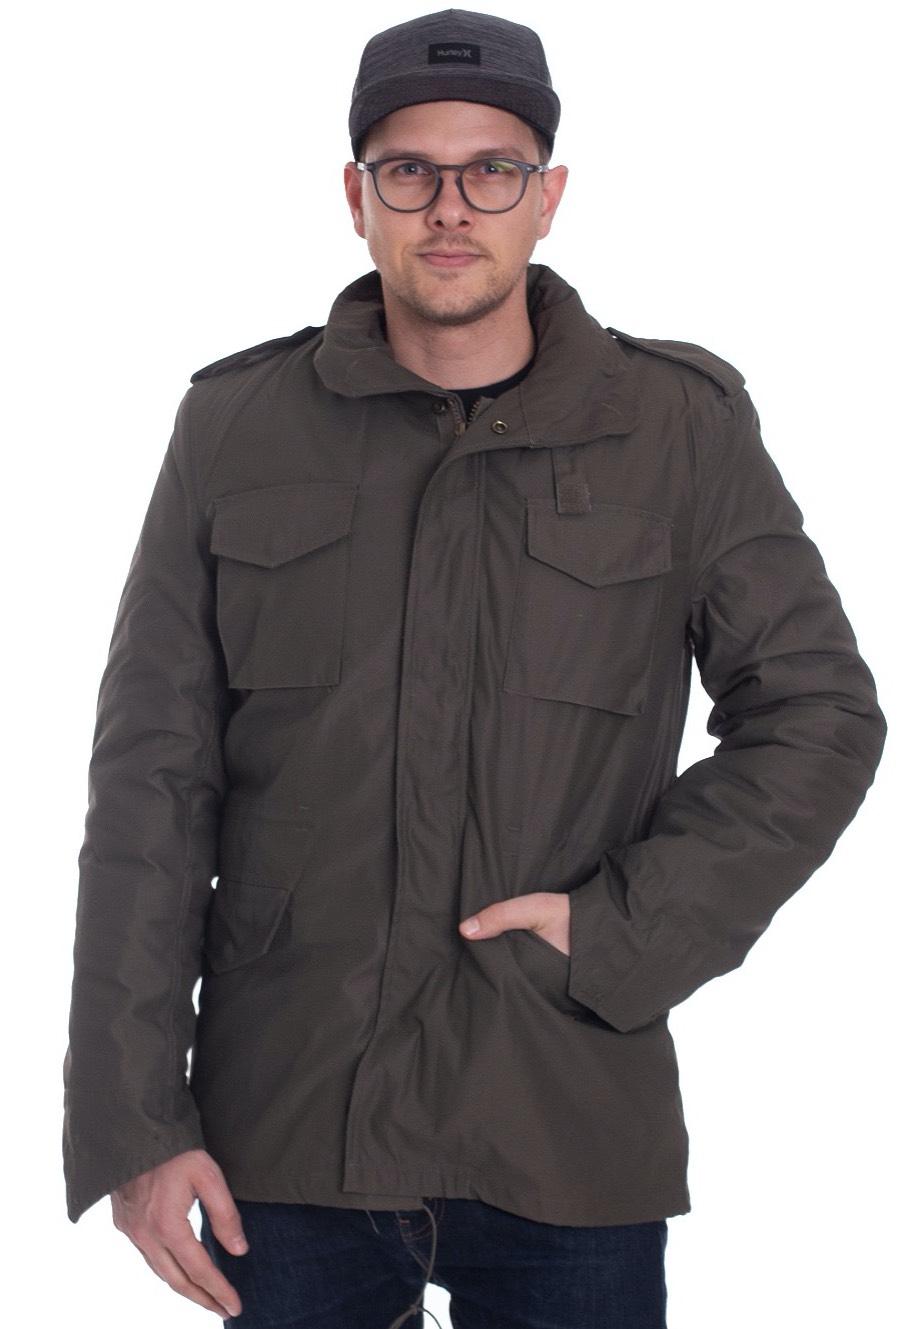 Surplus US Fieldjacket M 65 Jacka